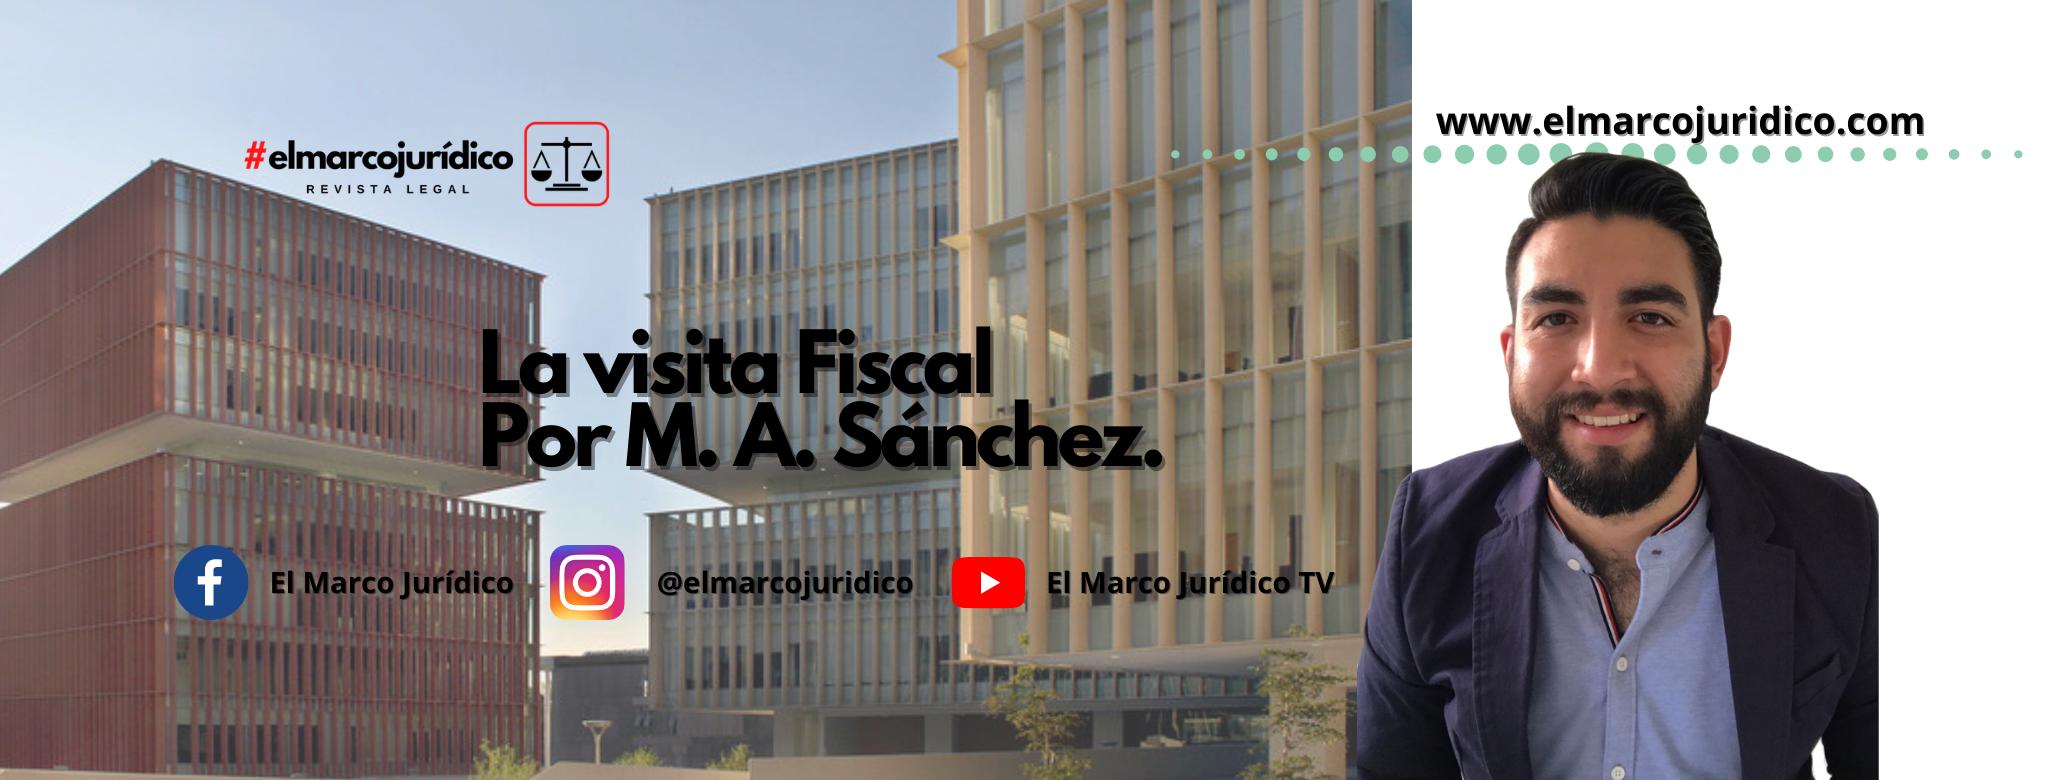 Visita fiscal   M. A. Sánchez.